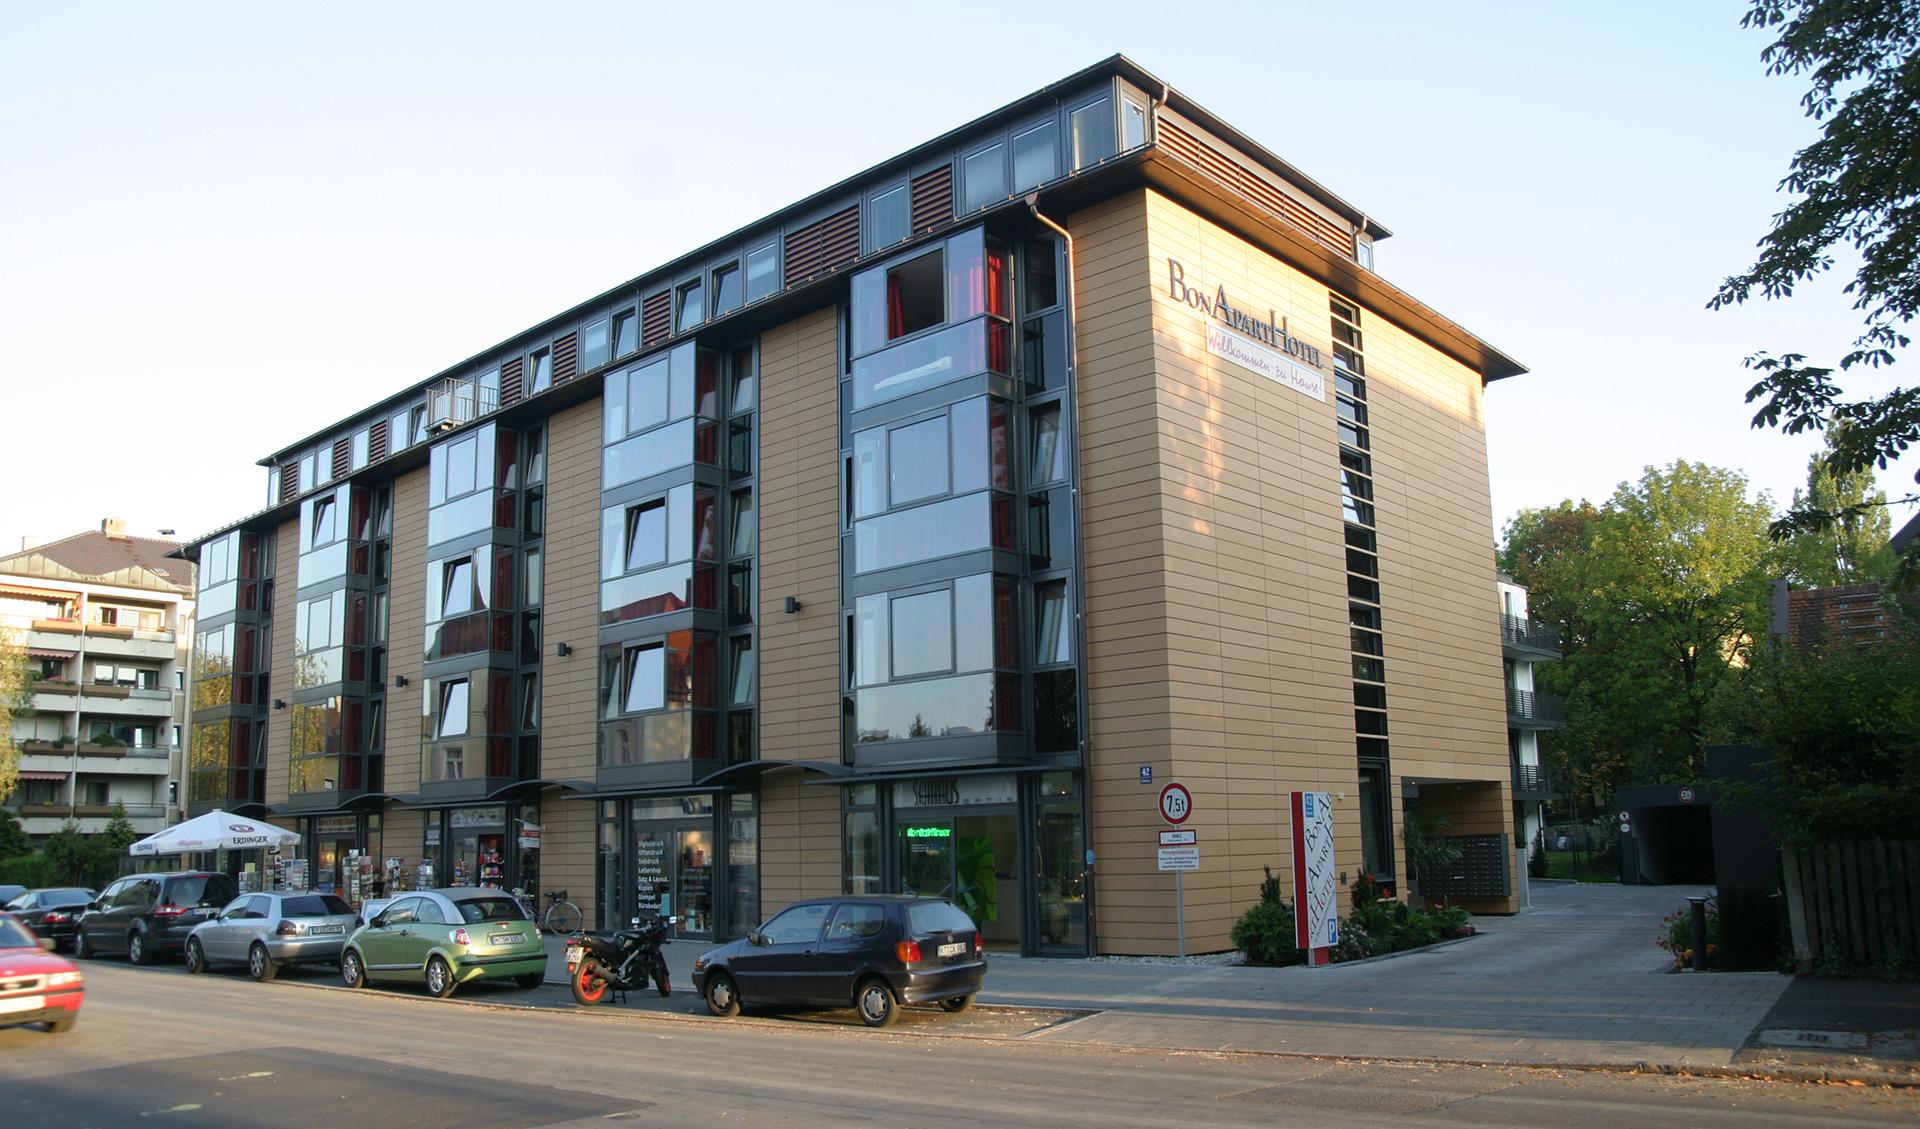 Bon Apart Hotel GmbH